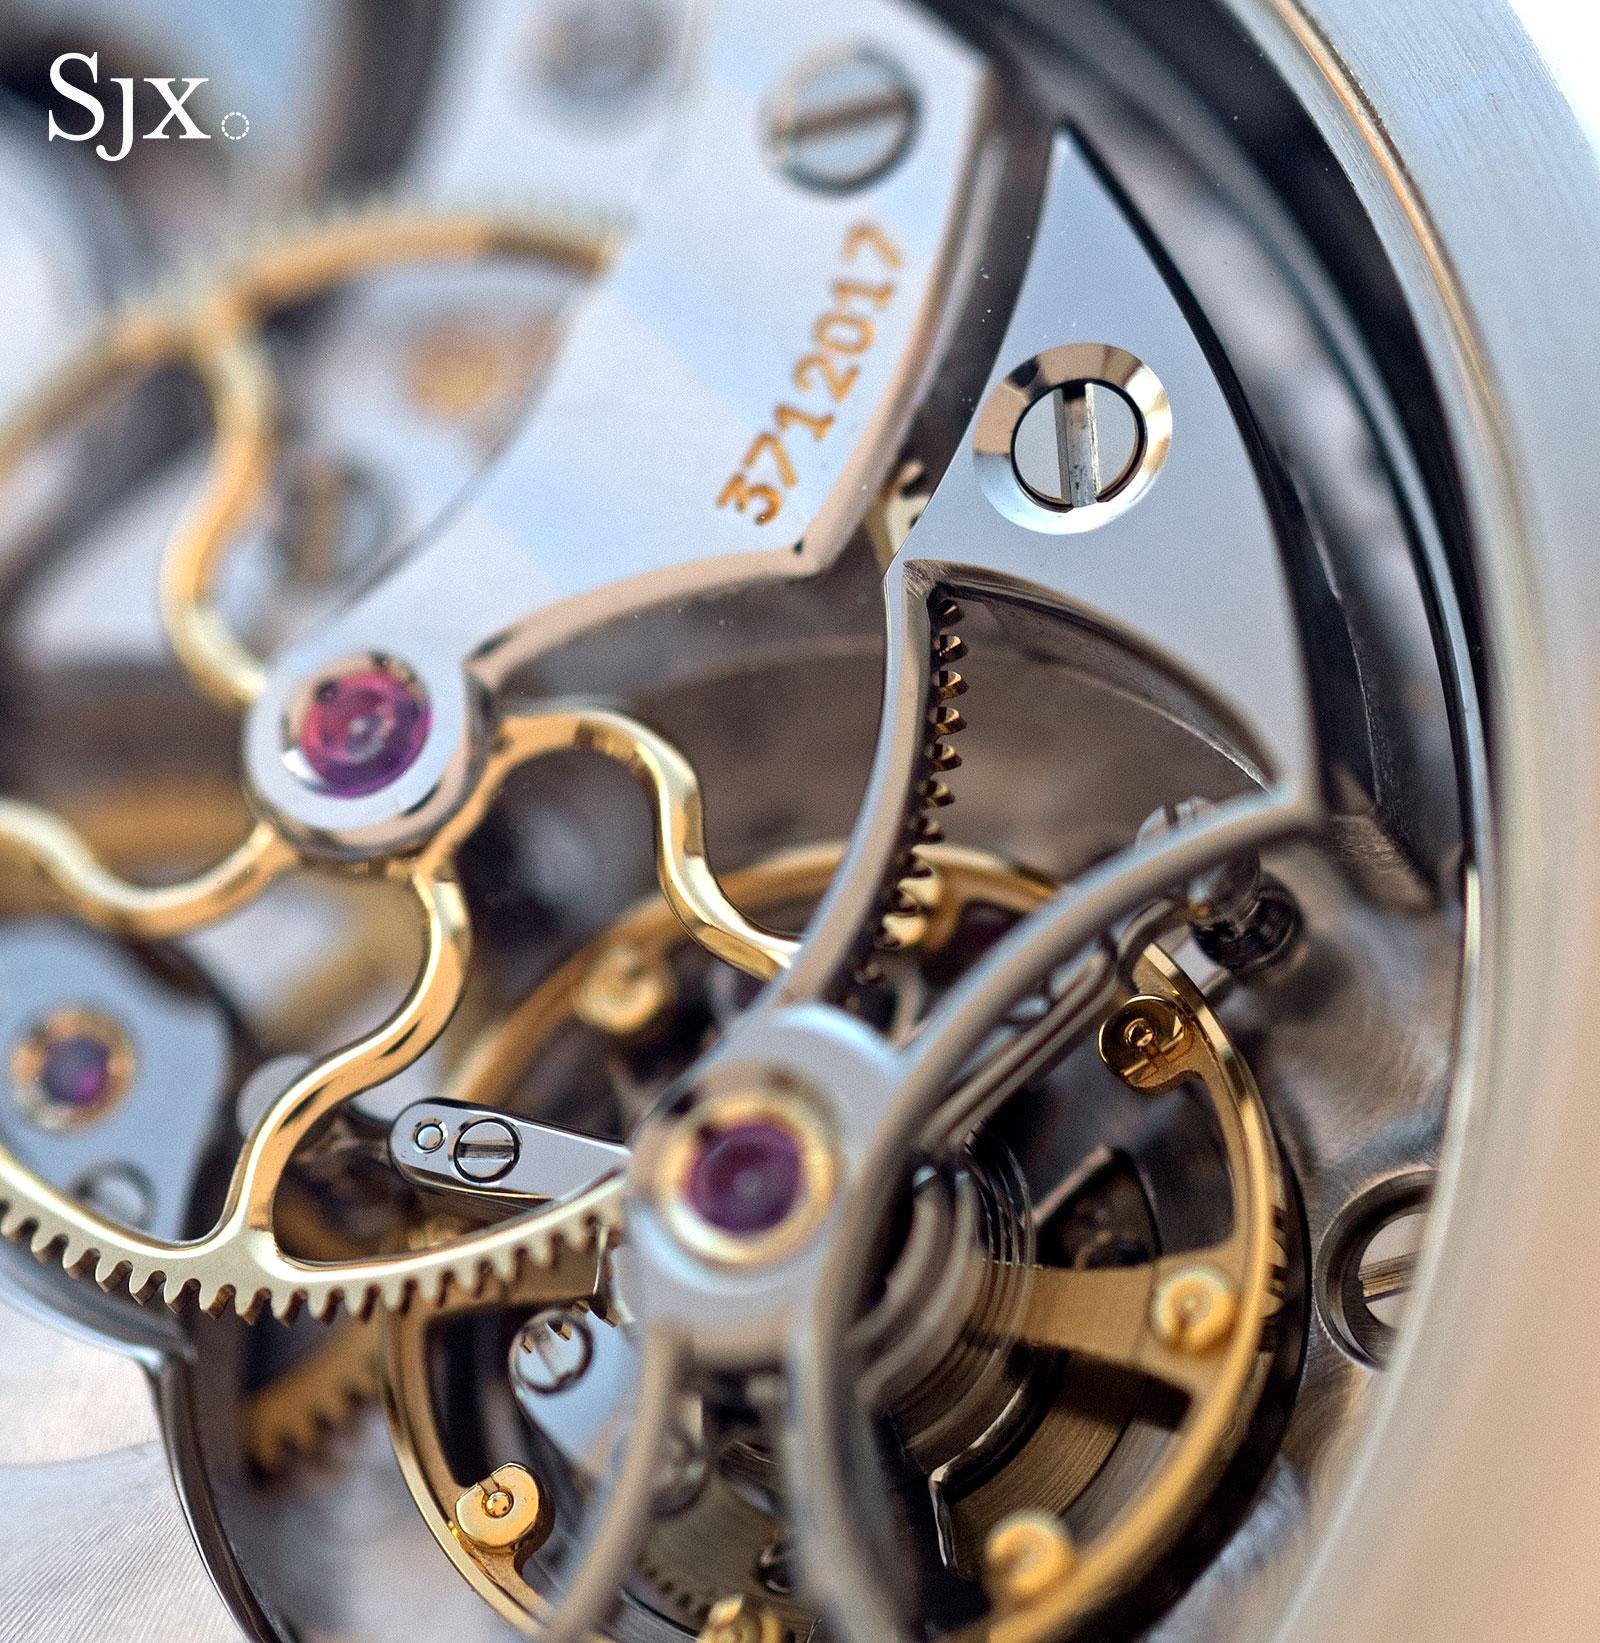 Patek Philippe 5207P Sothebys 5